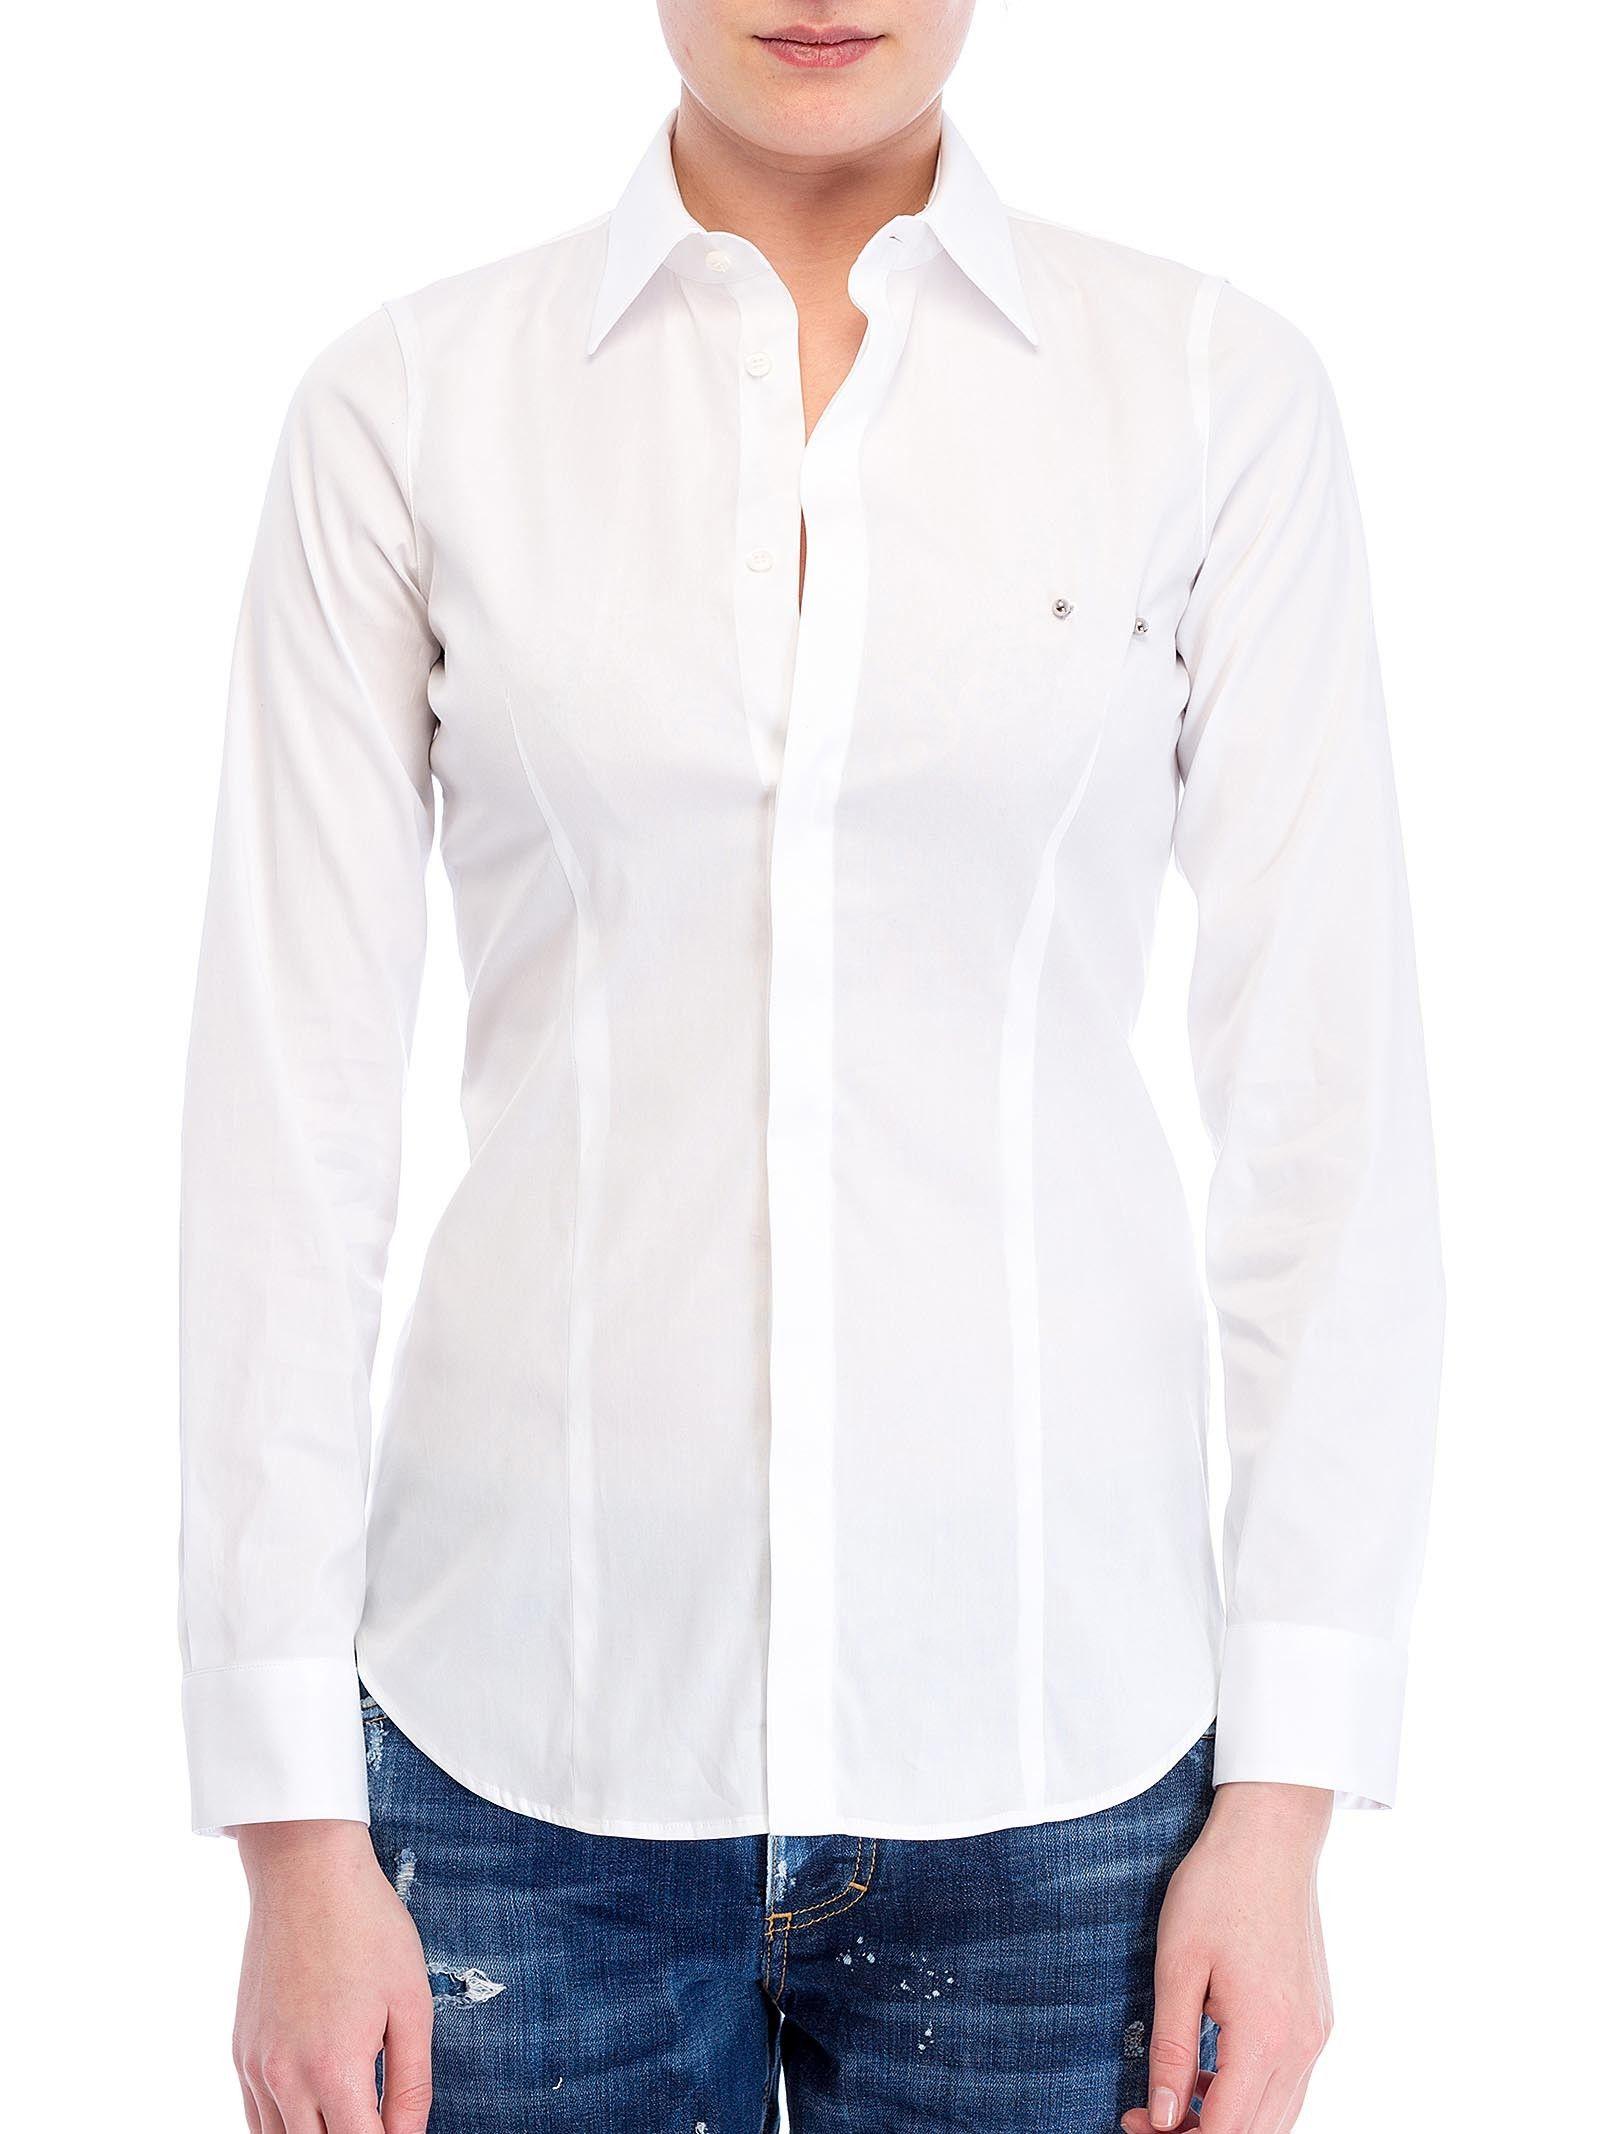 Dsquared White Tailored Shirt